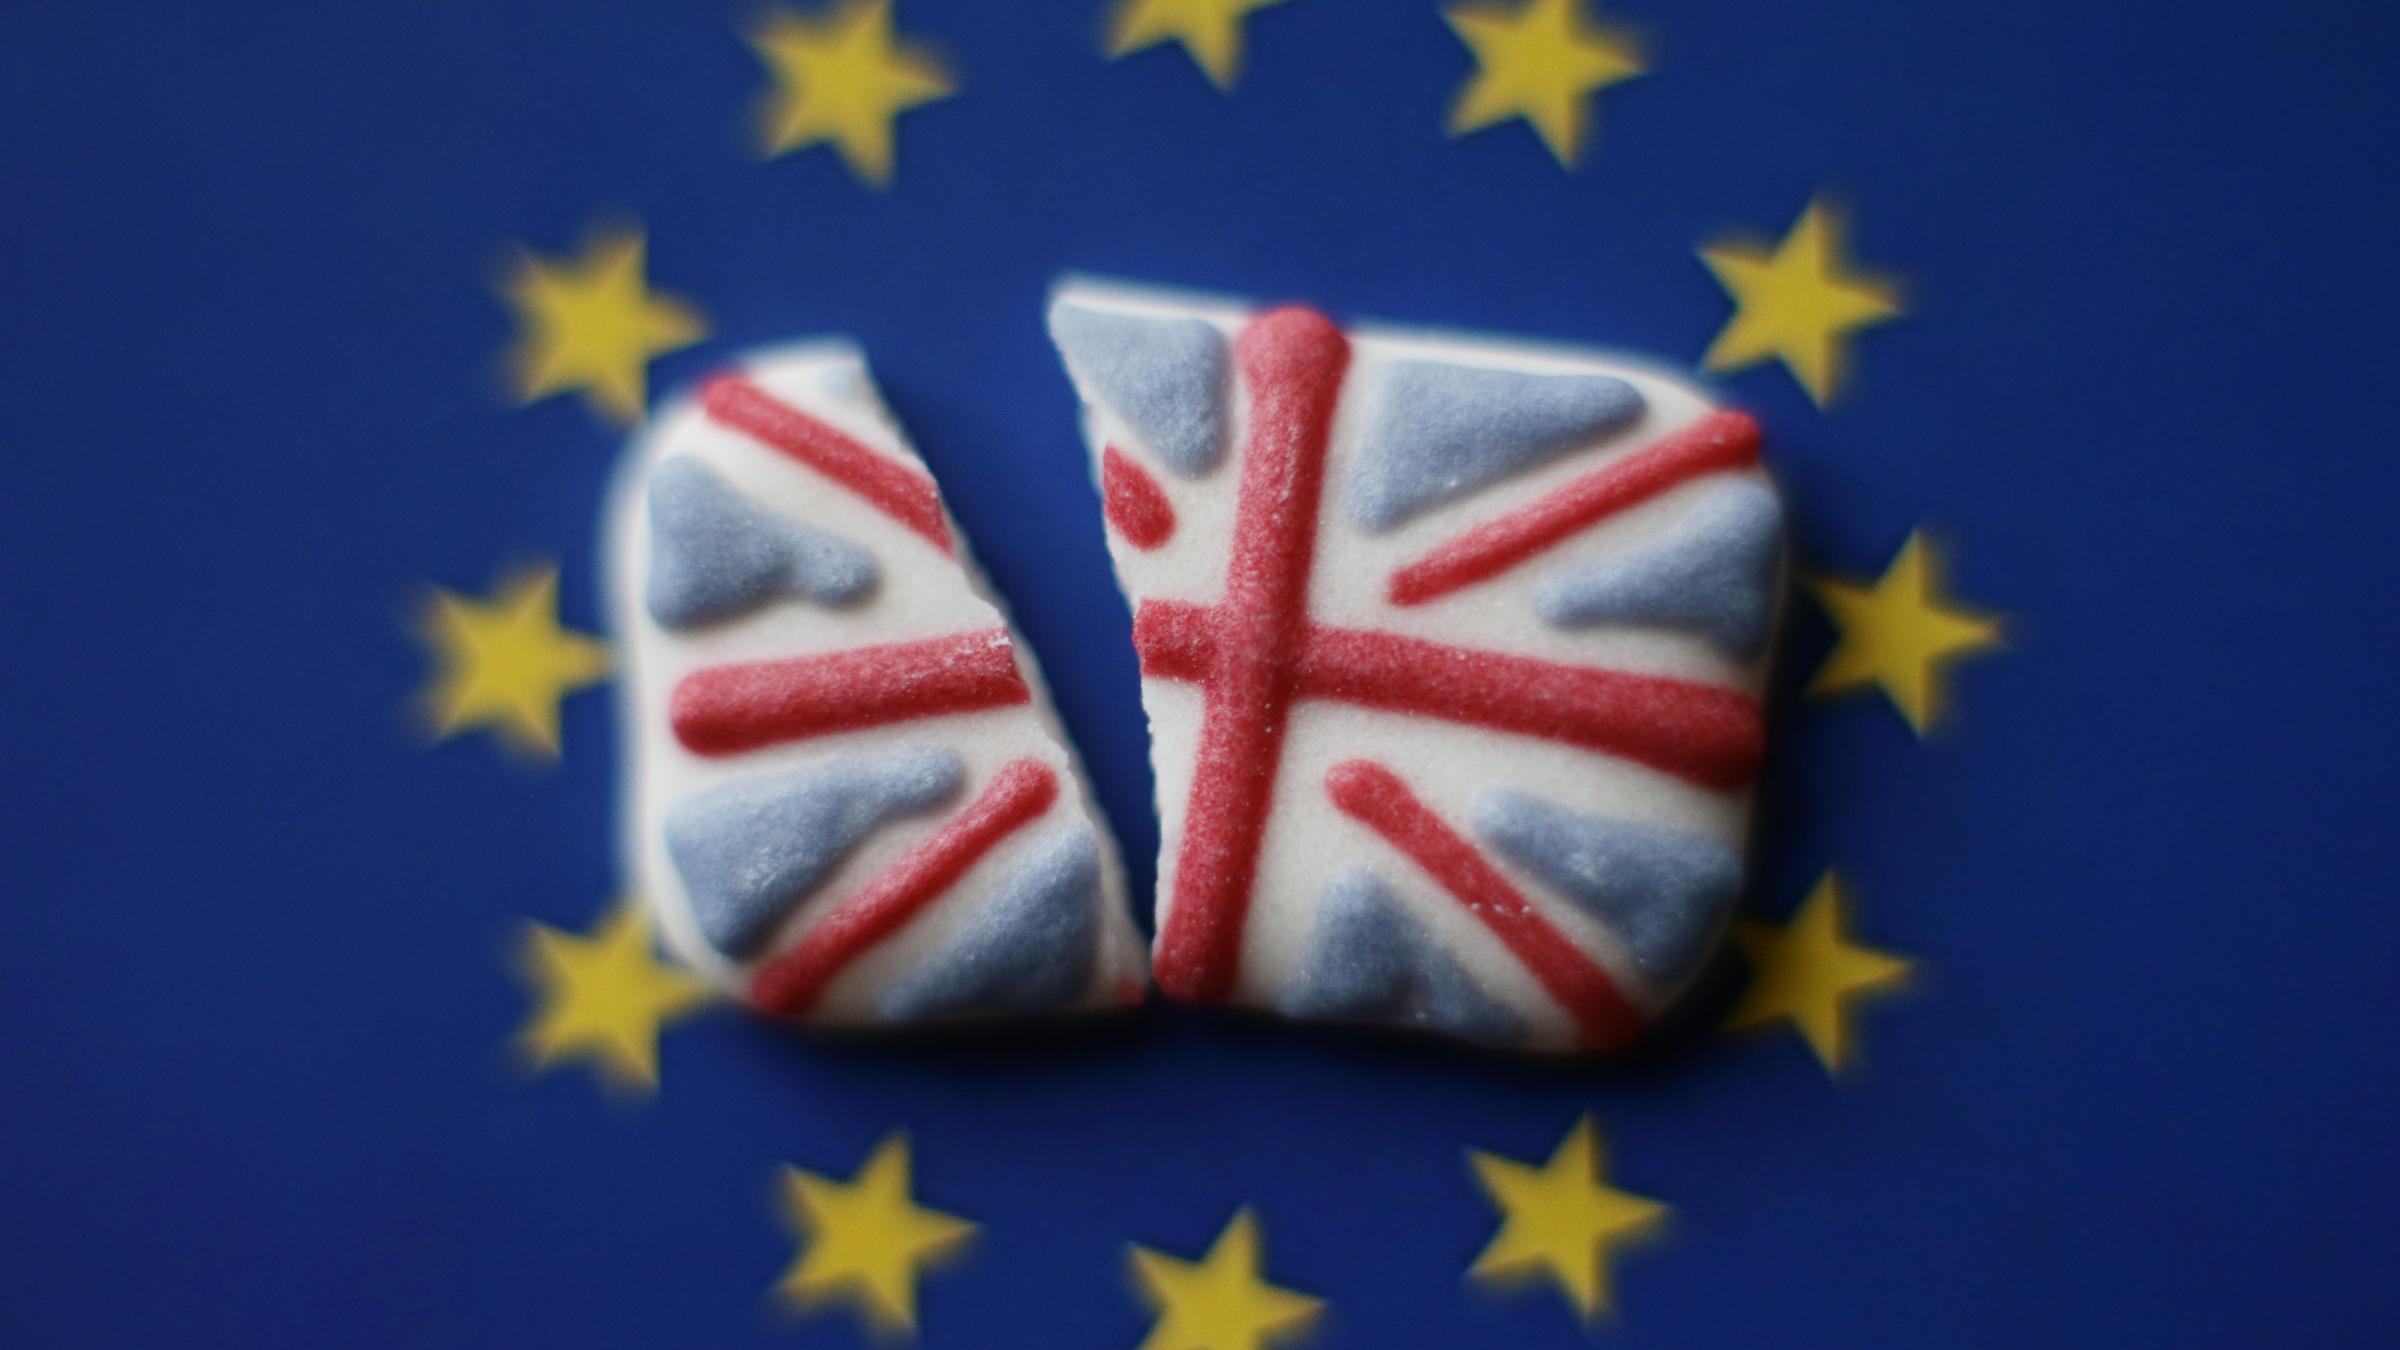 Philip Hammond: UK must be pragmatic in Brexit talks